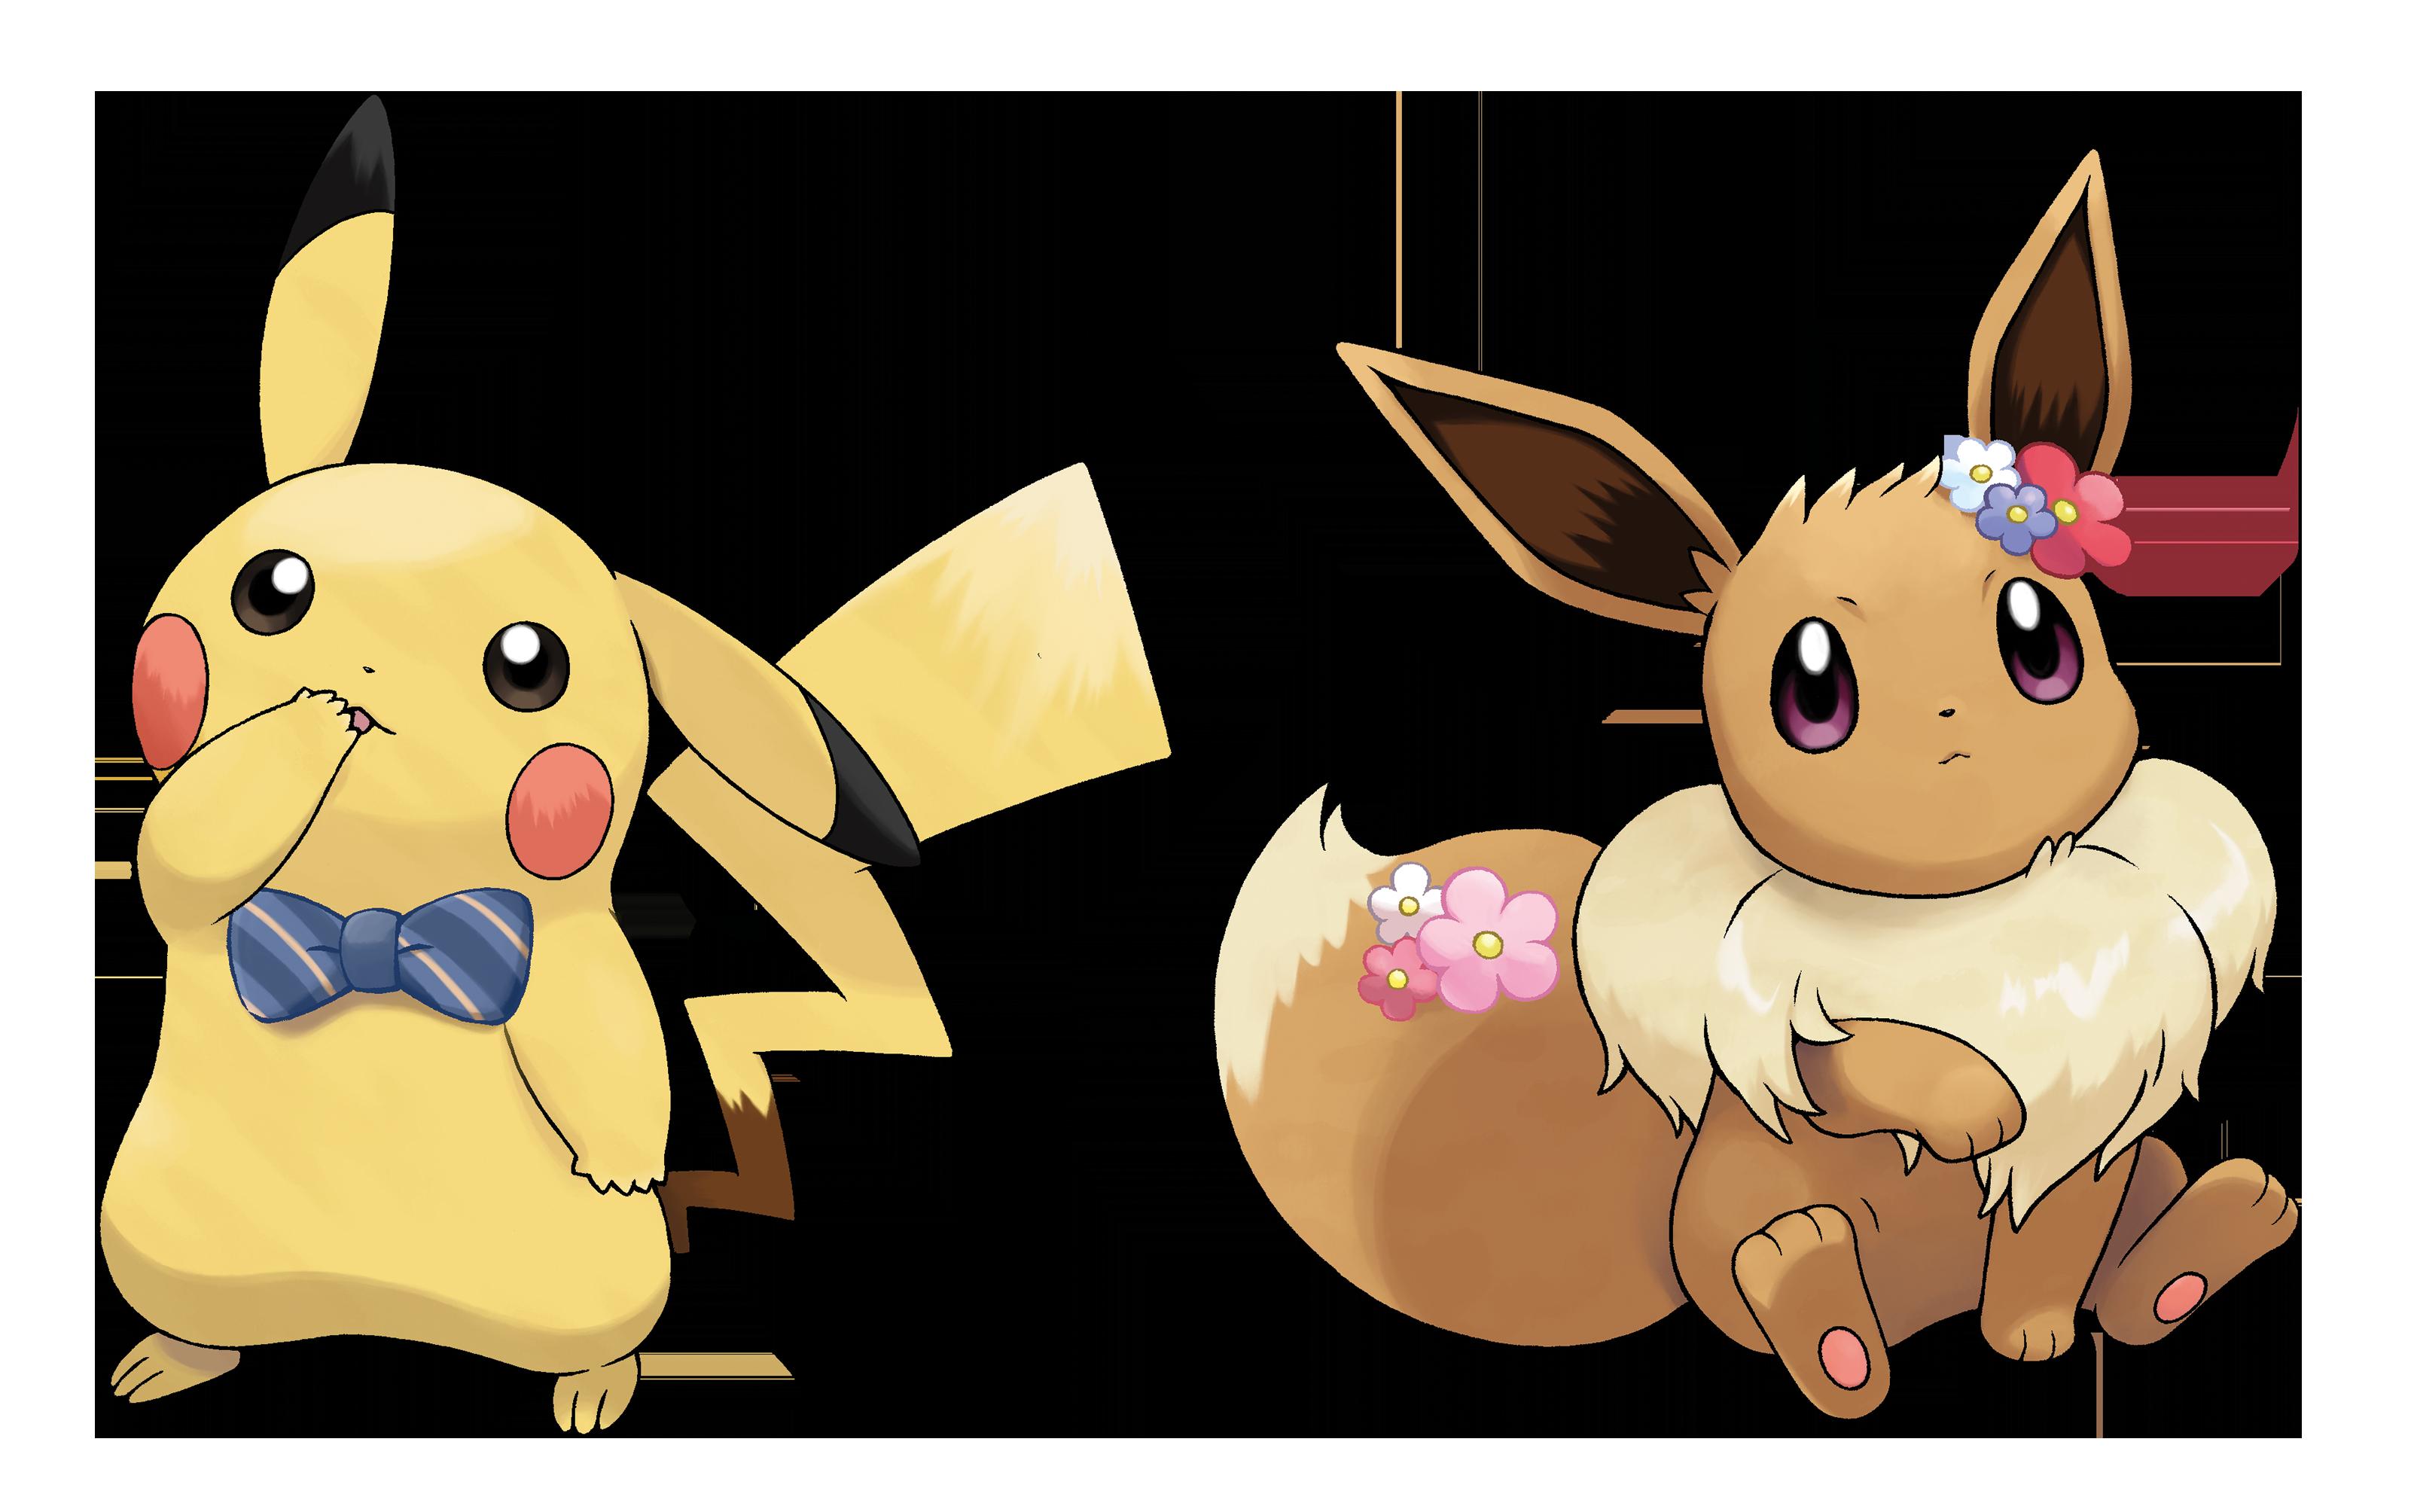 Pokémon POKEMON movie 2018 Zeraora Special ga-ole disc QR code